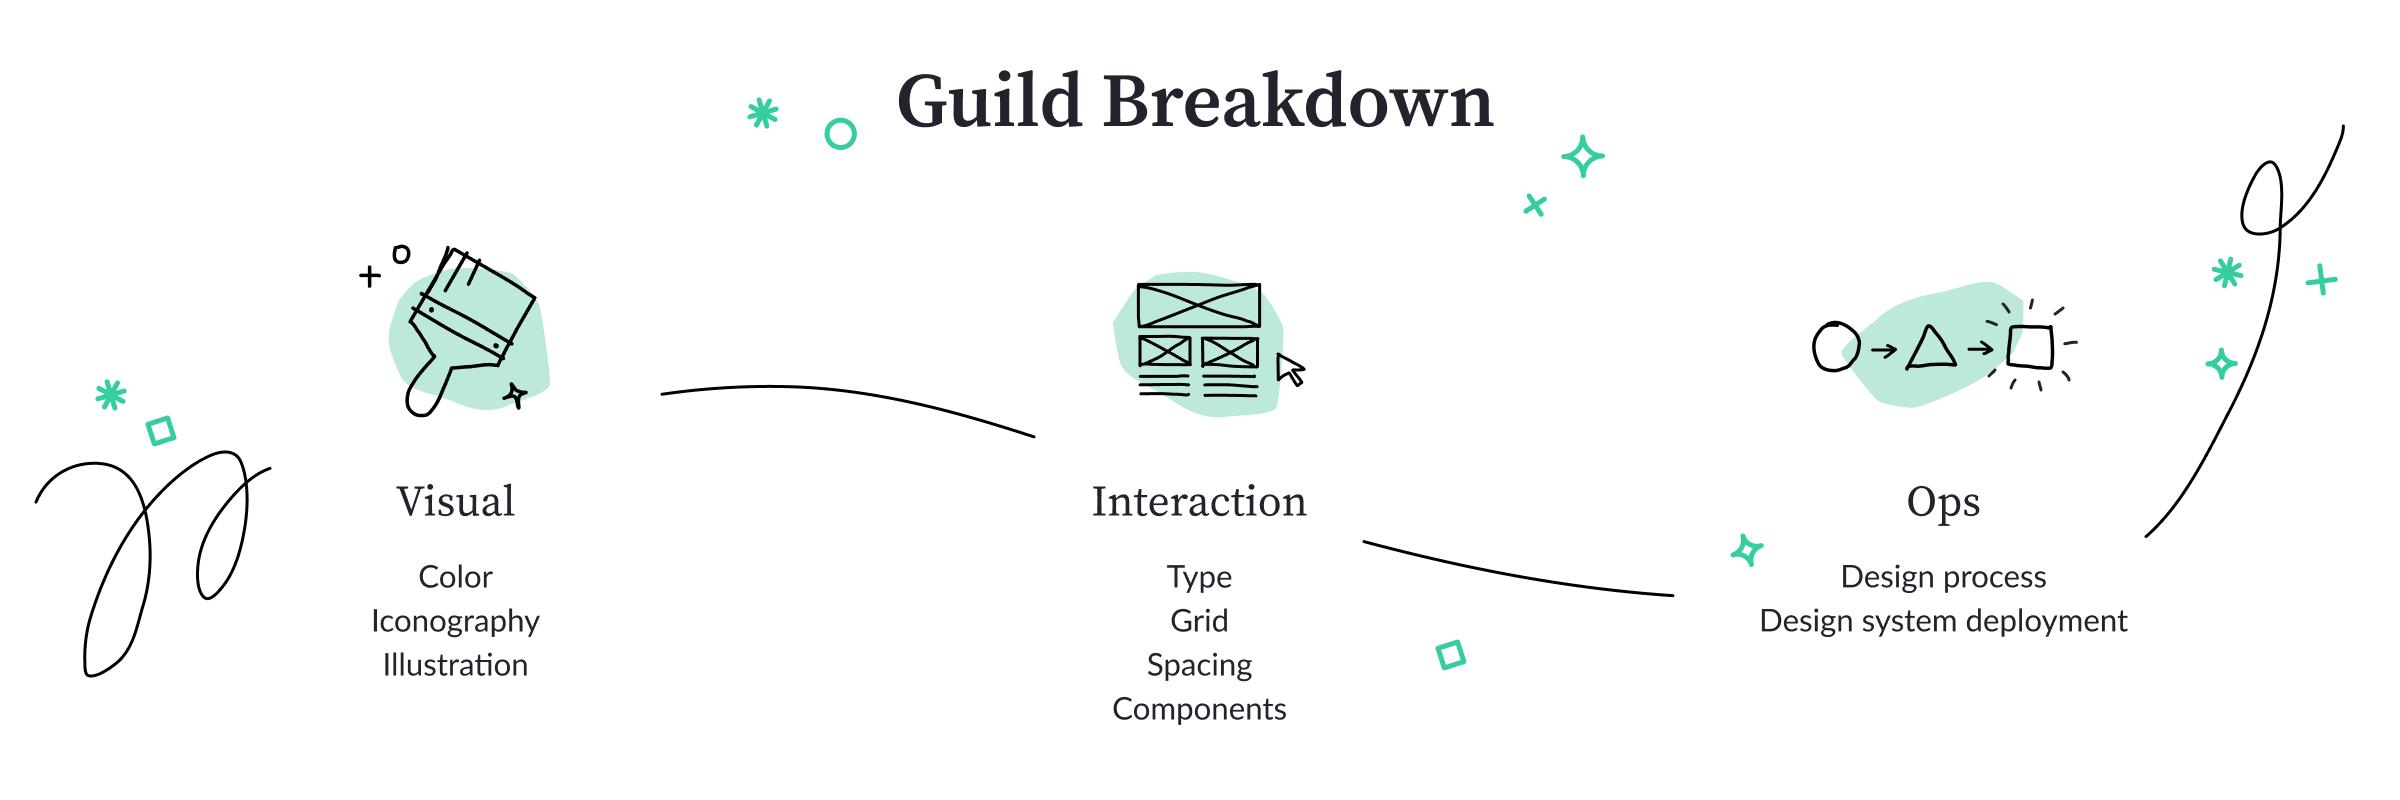 list building  internet marketing list  build a list  how to build a list  affiliate marketing  internet marketing 3 - Guild Breakdown